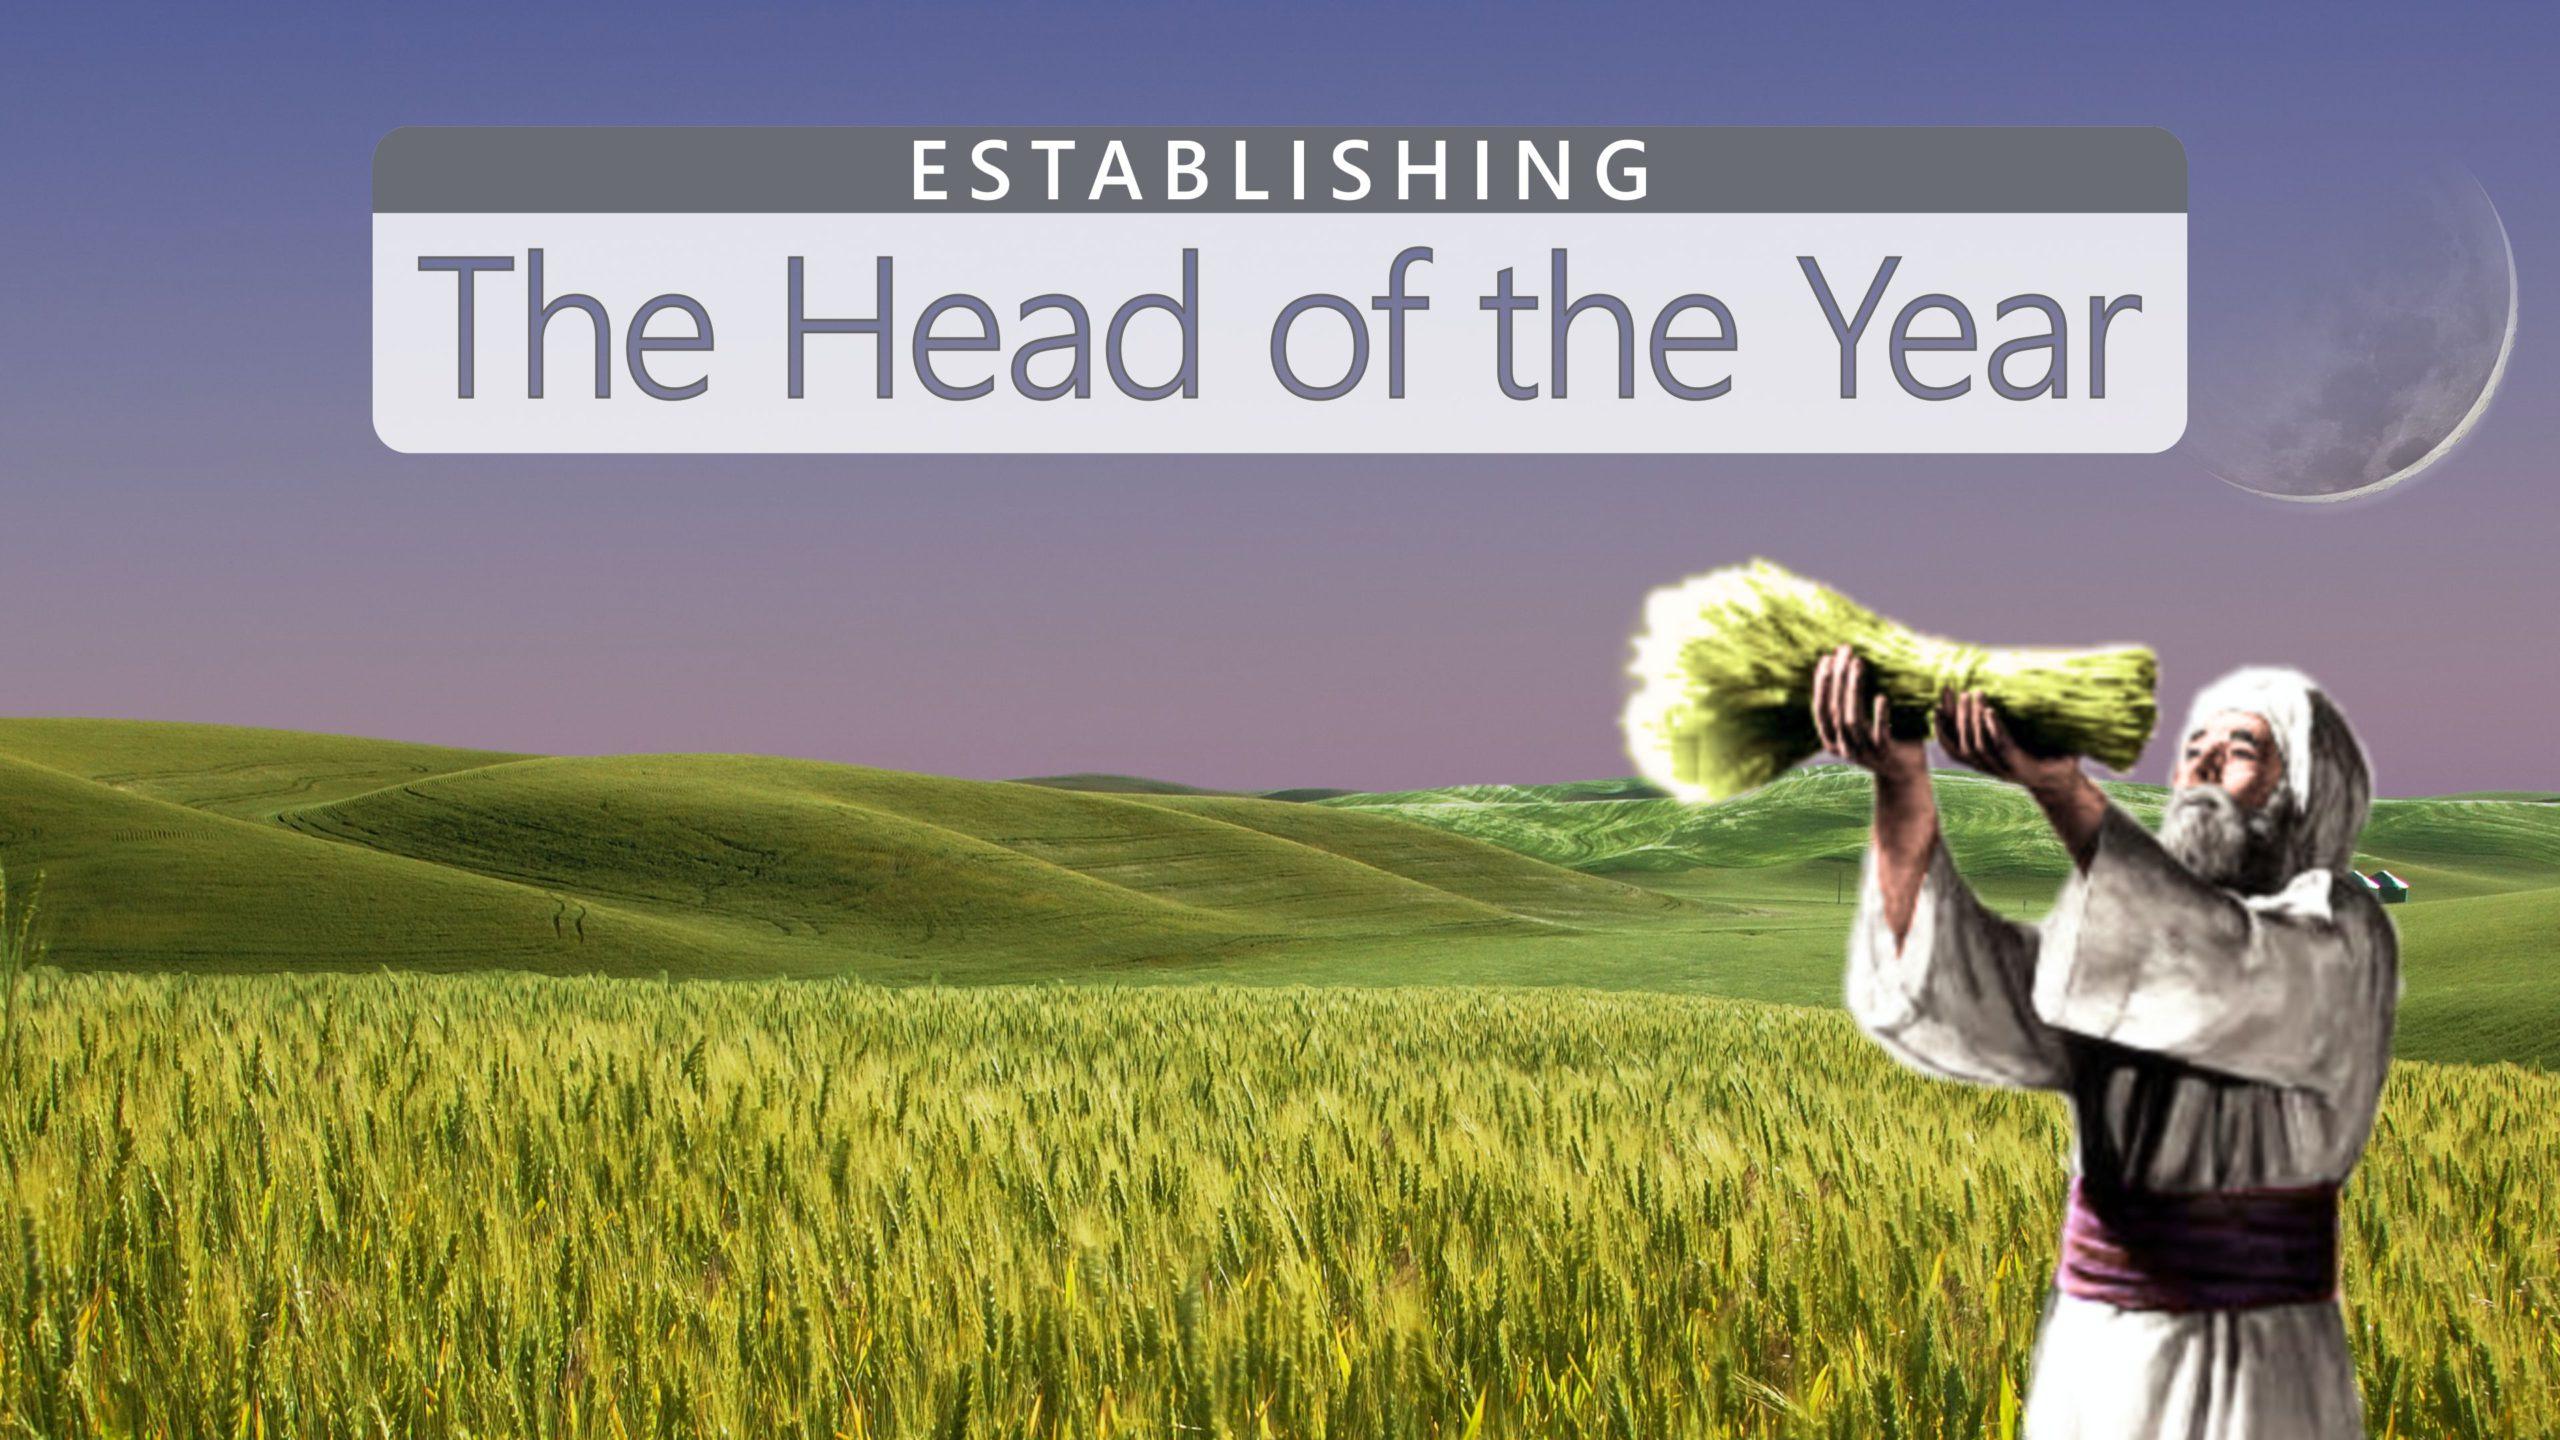 Establishing the Head of the Year